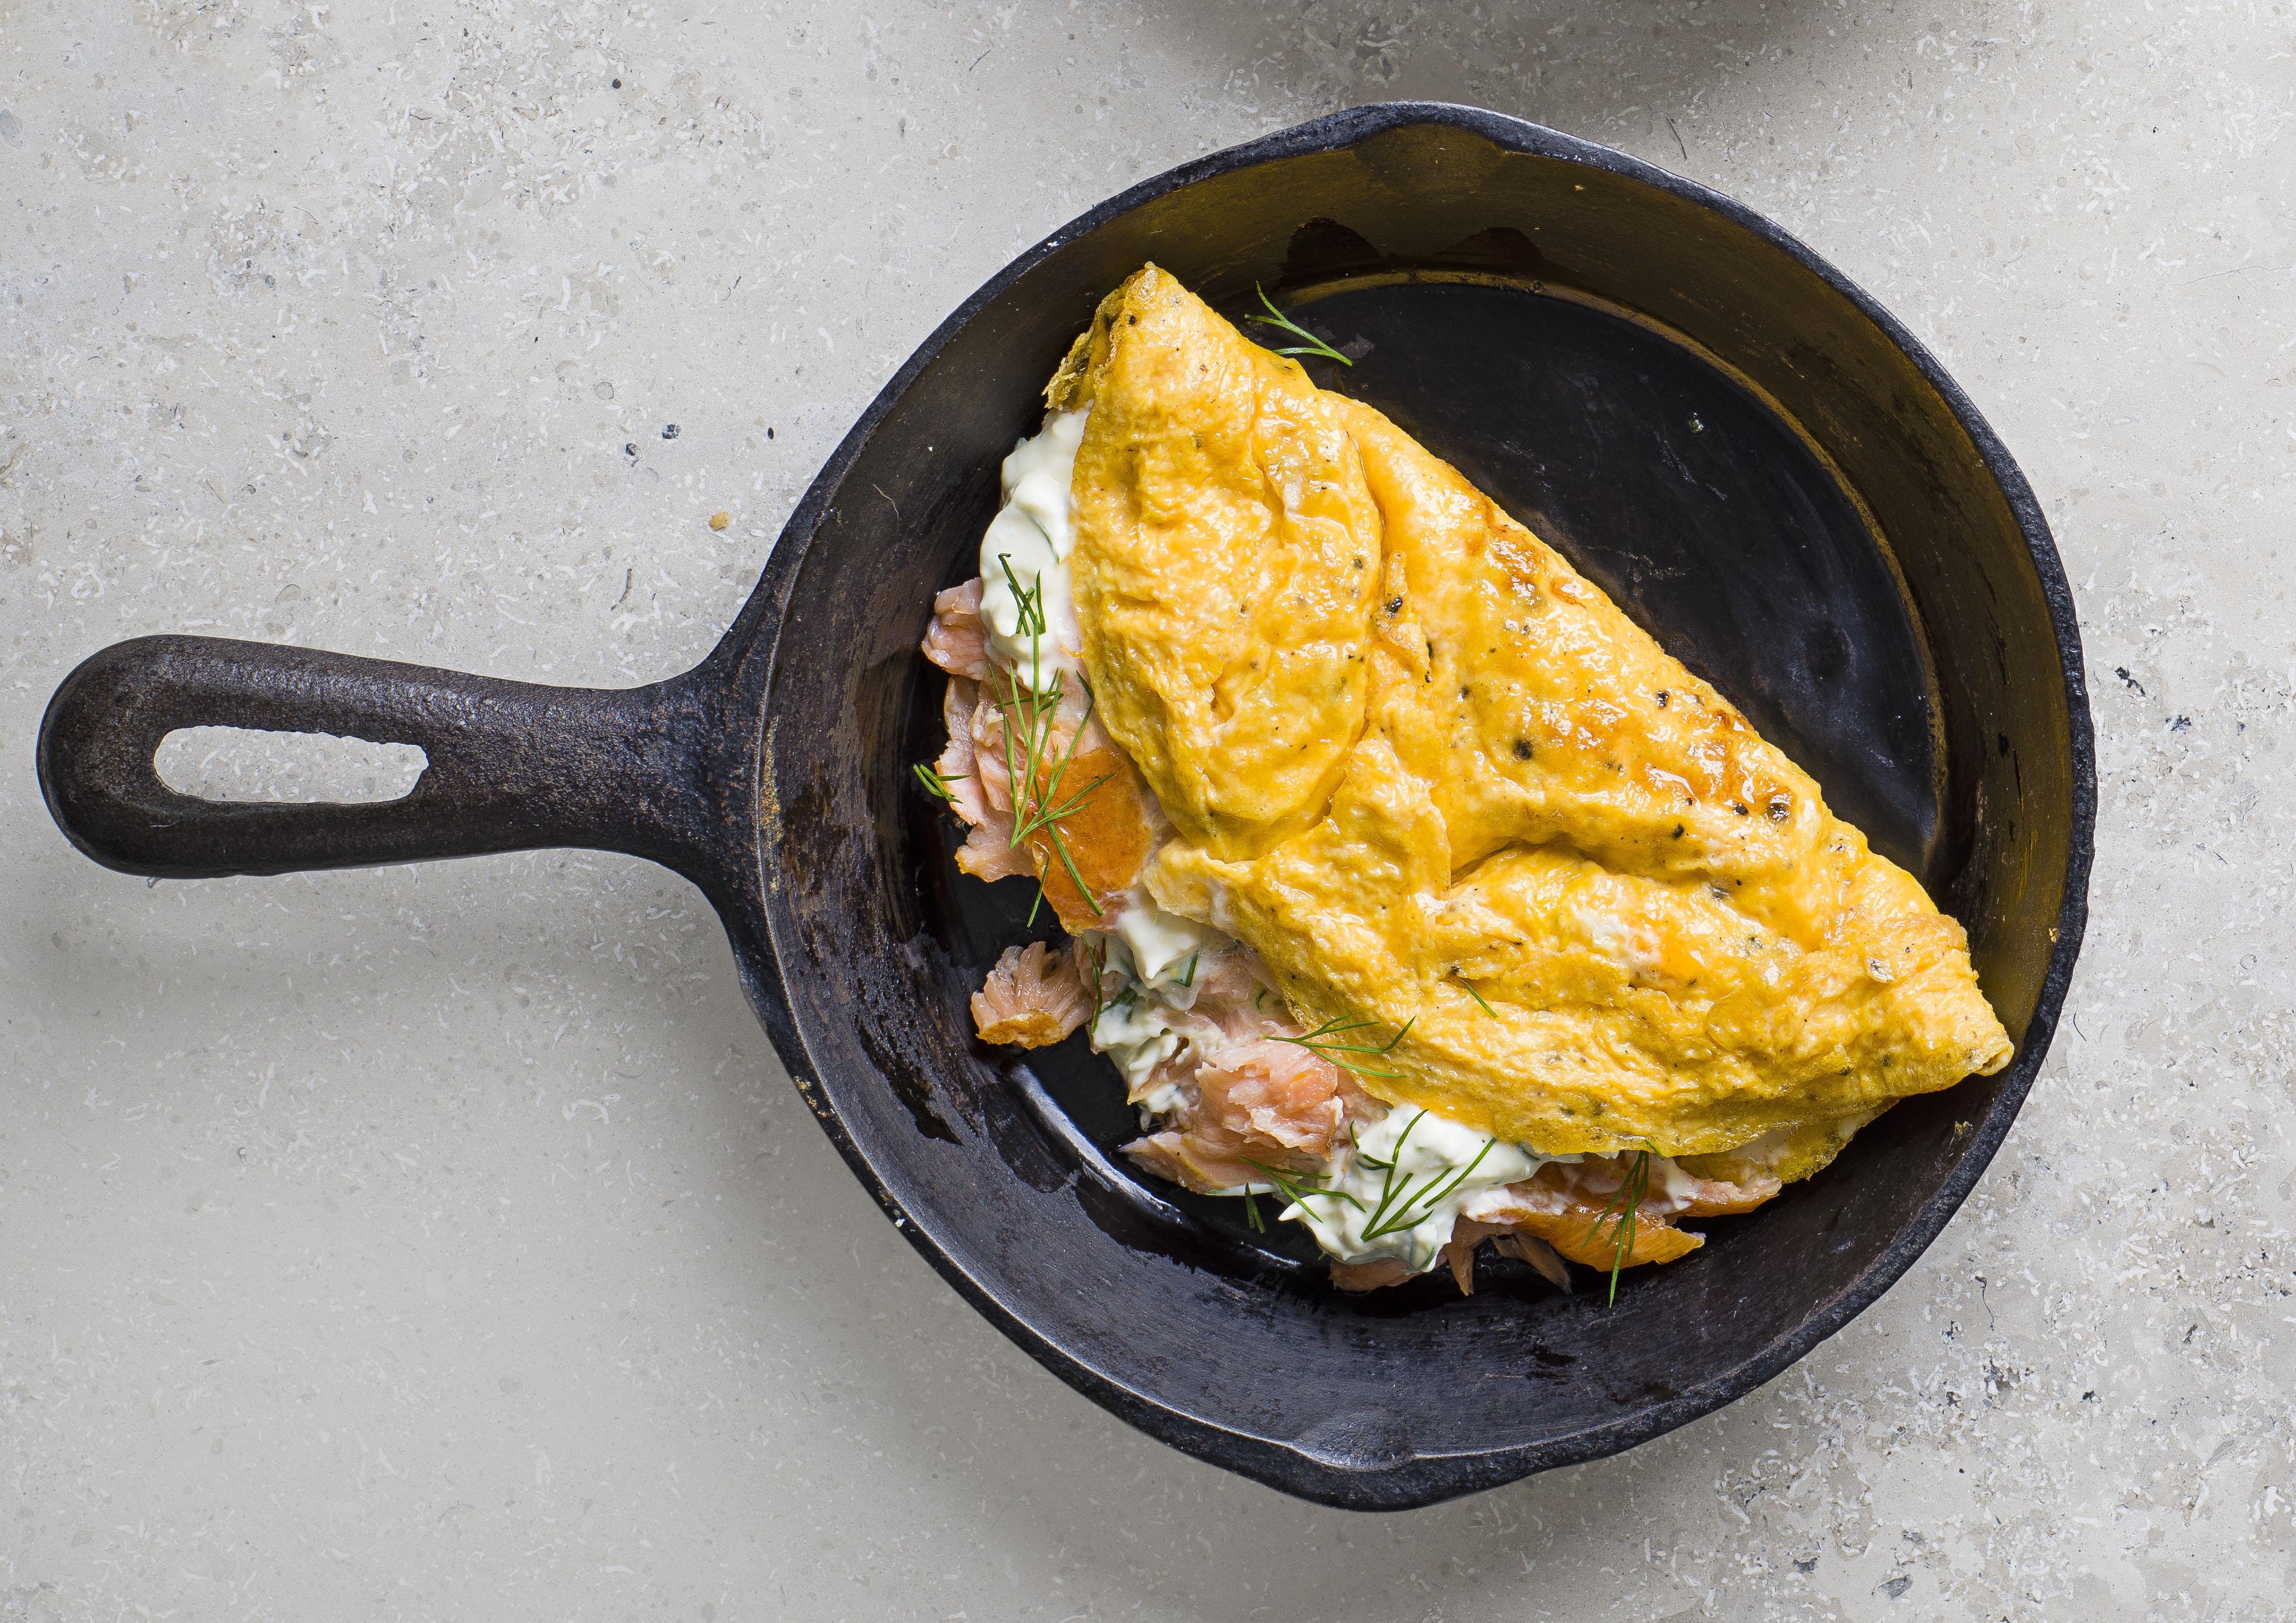 Hot smoked salmon, lemon crème fraîche and dill recipe